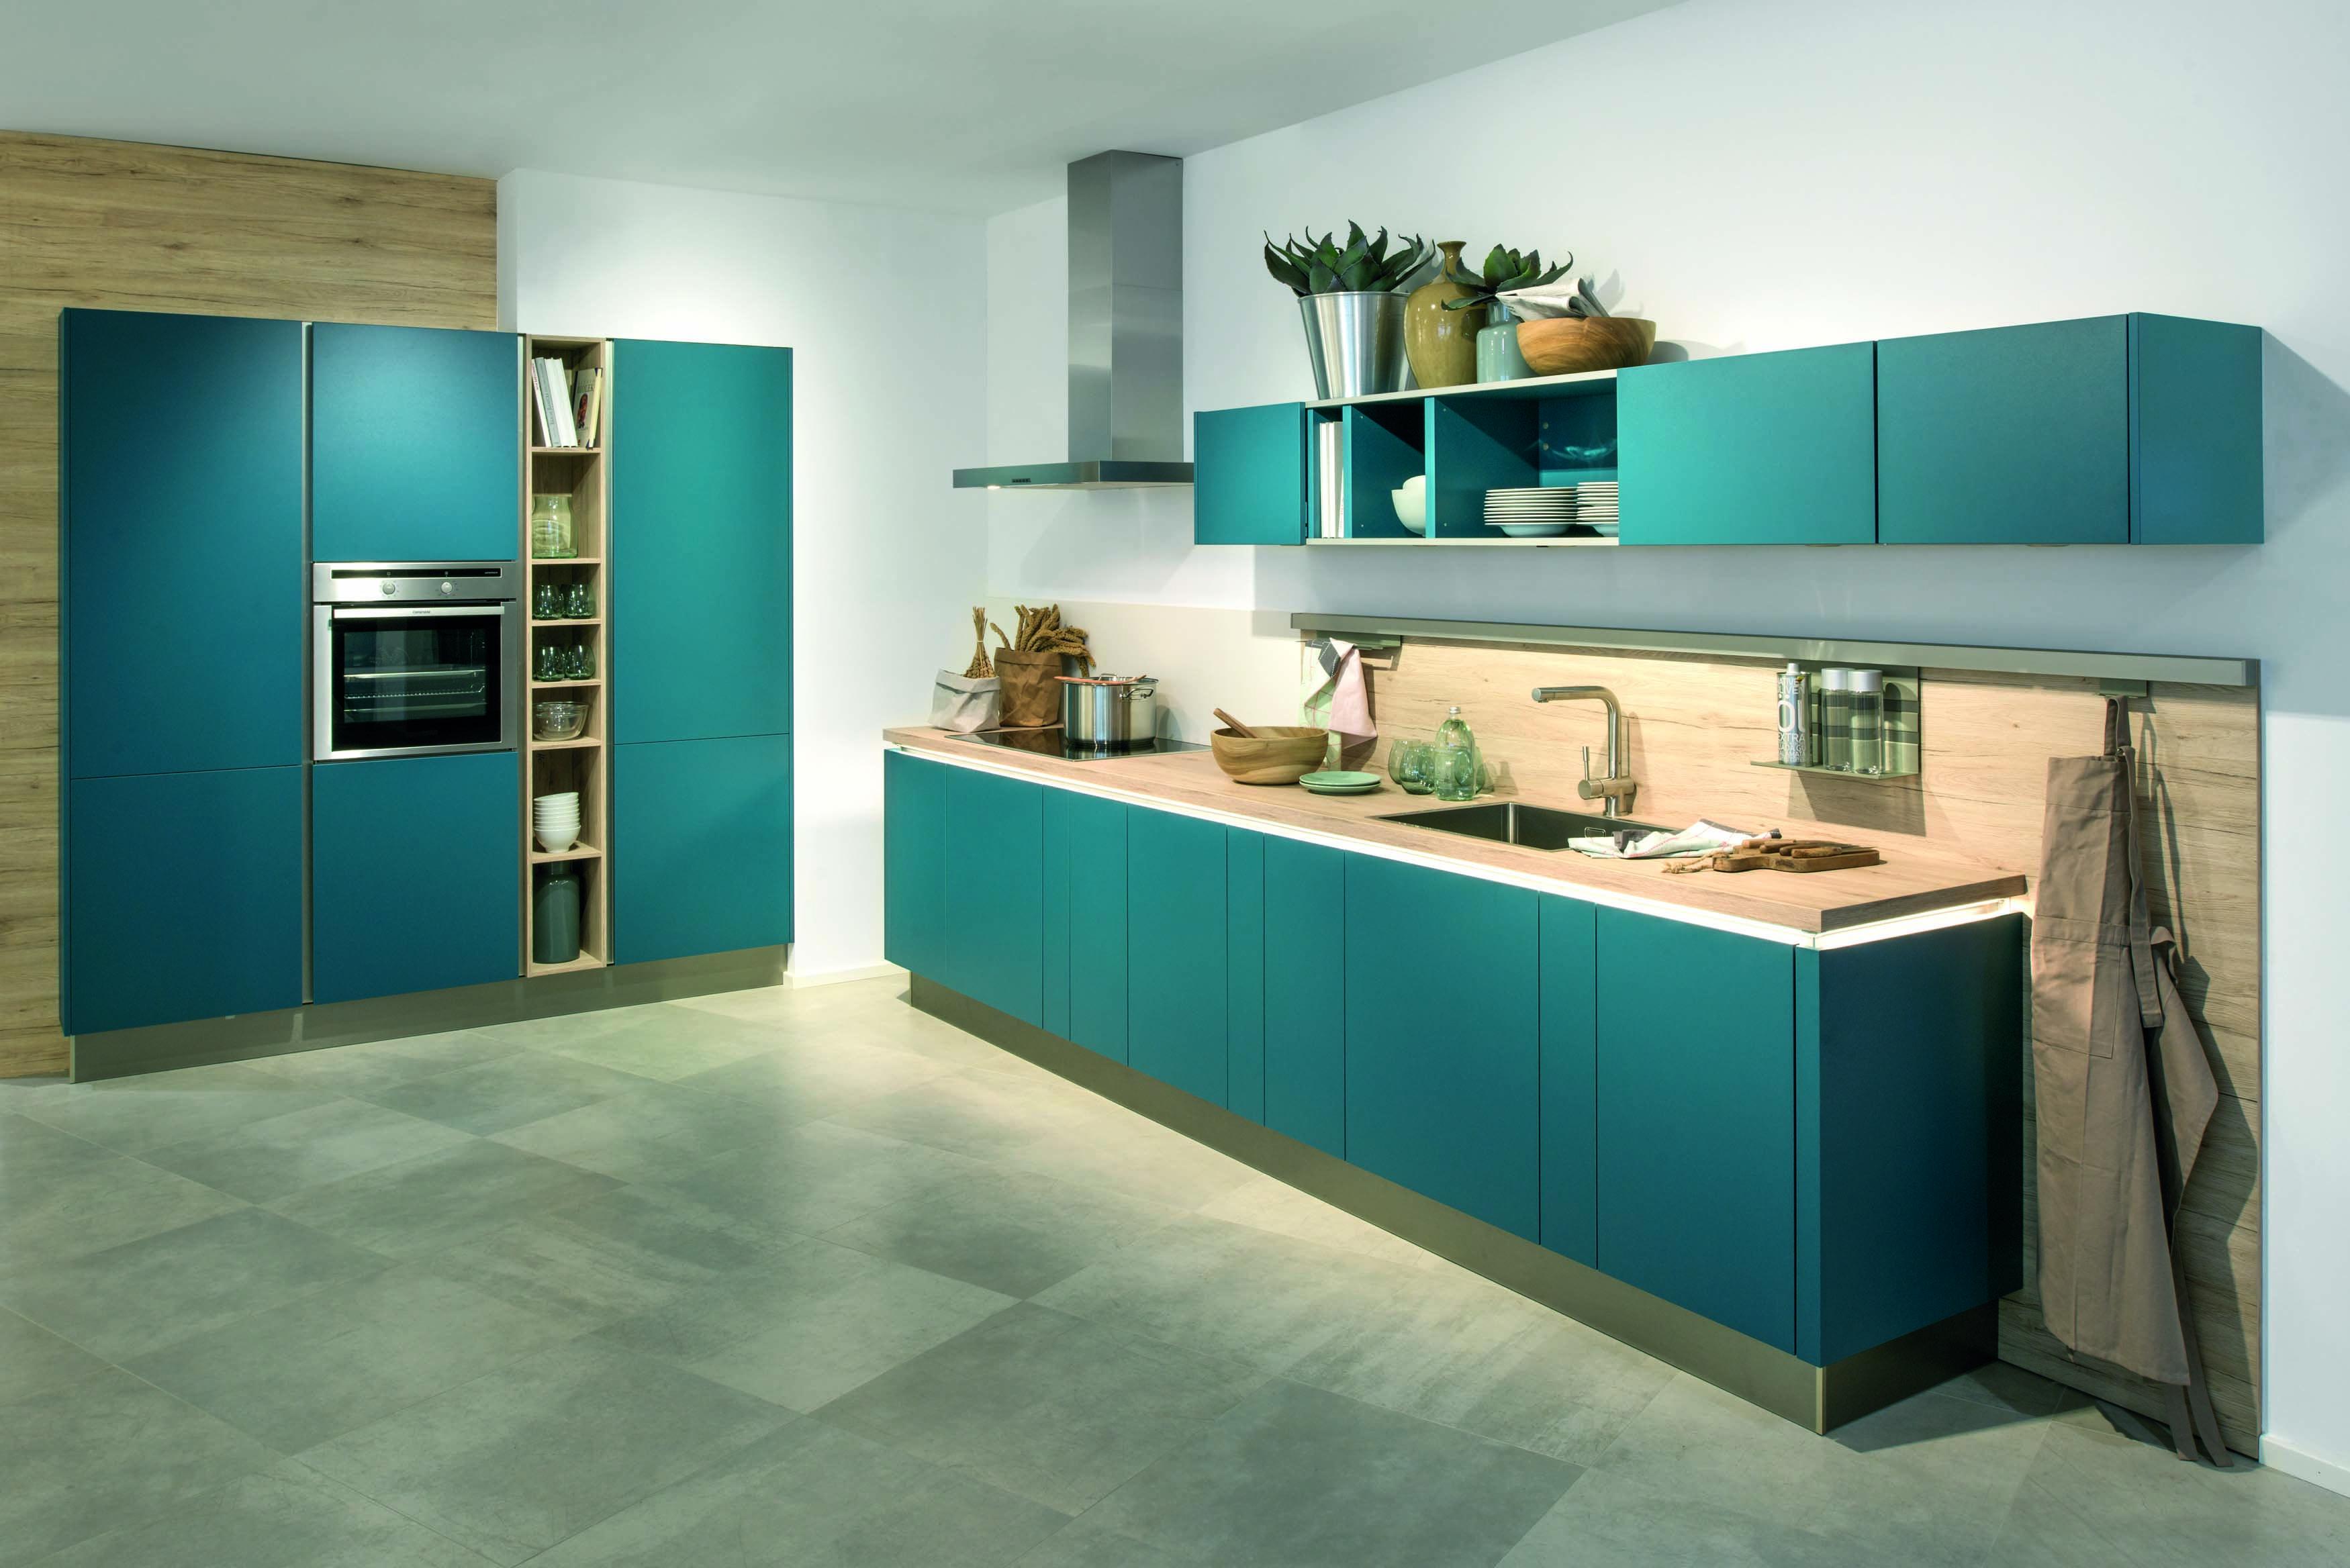 glacier aubergine and jasmine | House Ideas - Aga | Pinterest | Aga ...